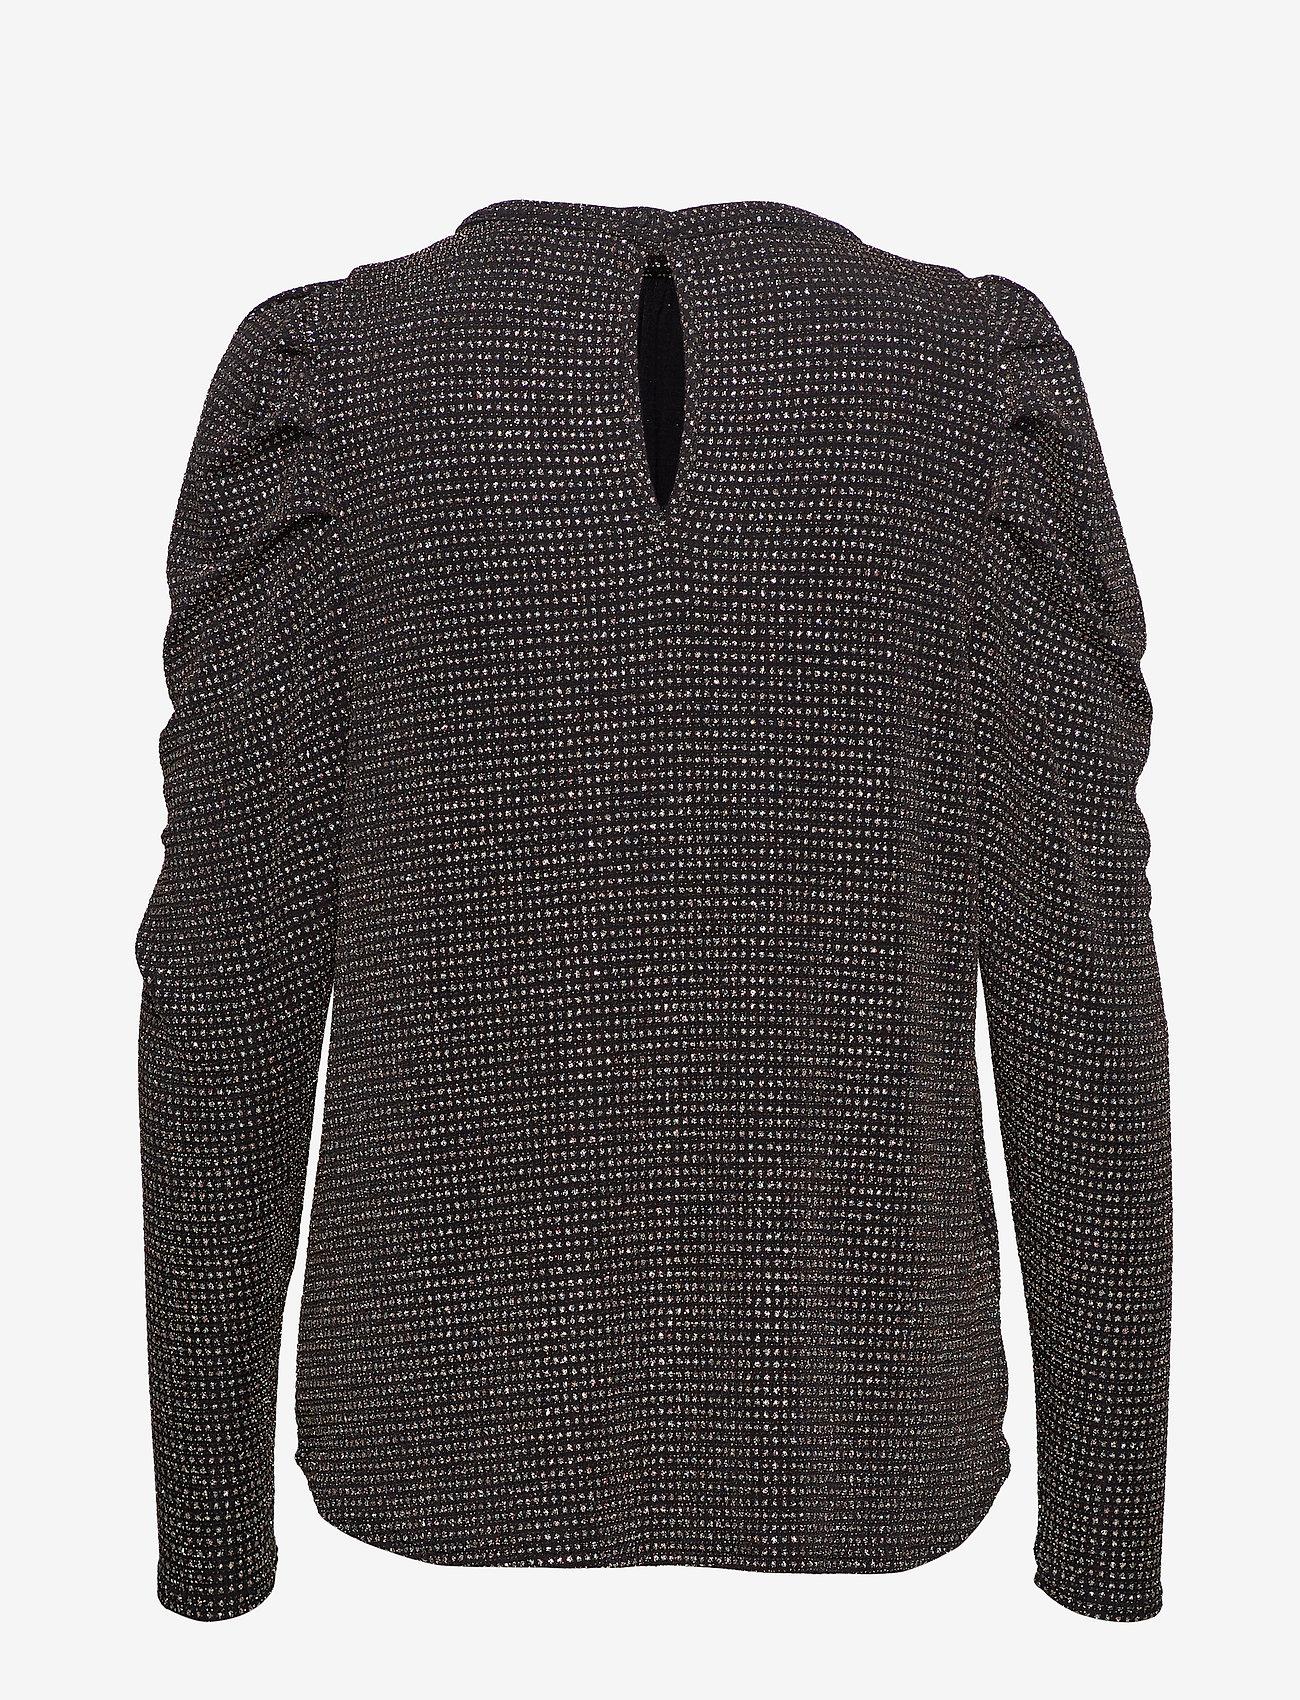 Ravn * Boozt Glimmer Shirt Exclusive (001 Black) - Ravn rf03NF